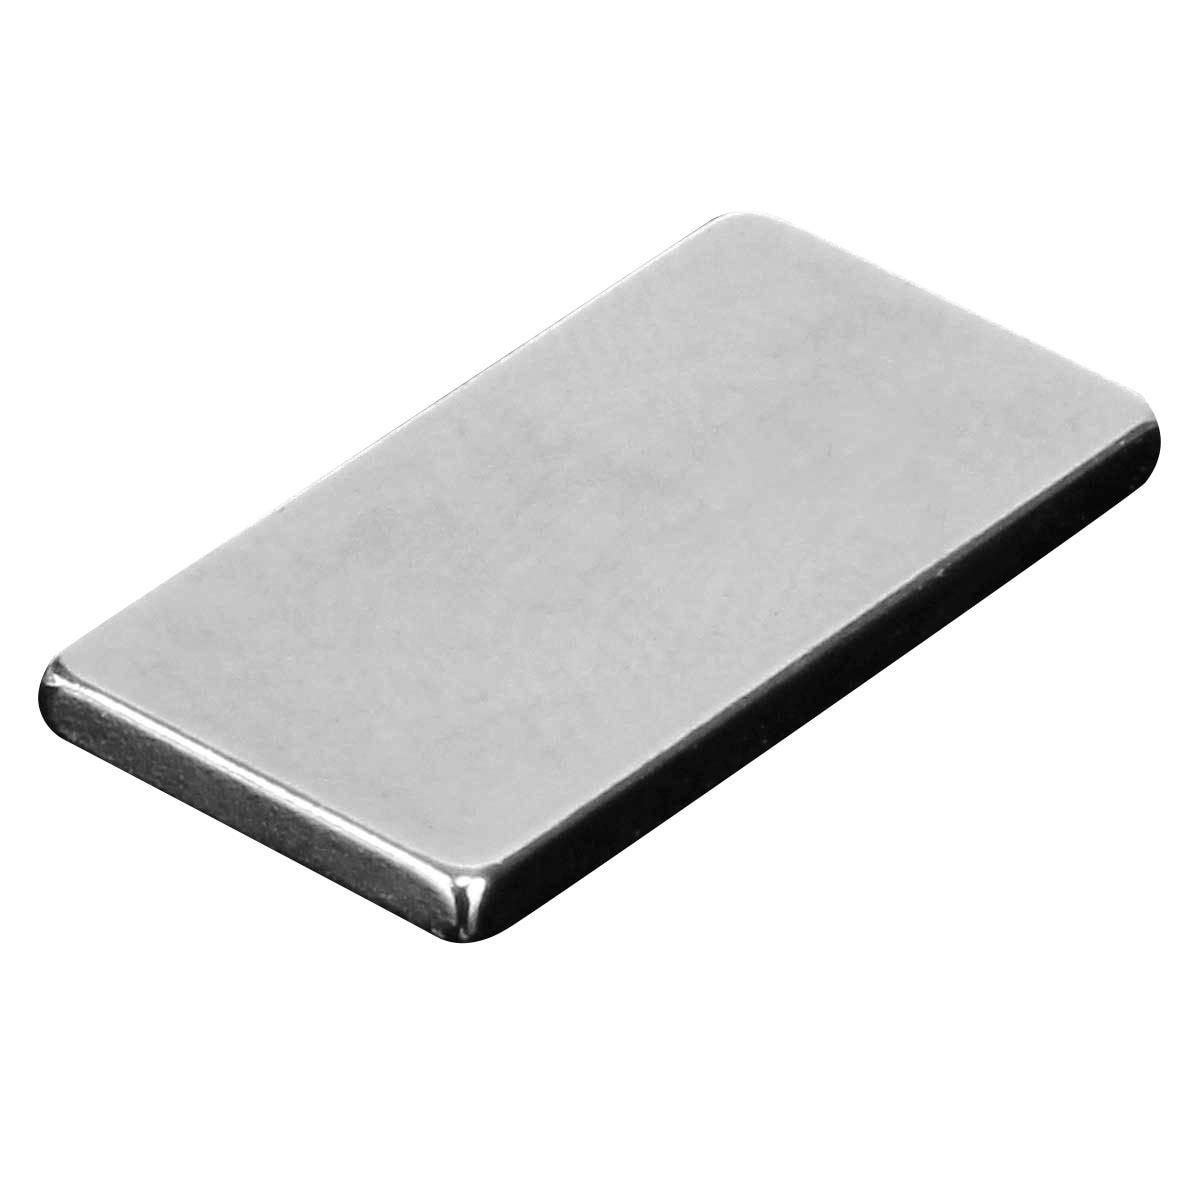 20 PCs N52 Neodymium Magnet 20x10x2mm Permanent NdFeB Small Tiny Mini Super Powerful Strongest Magnetic rectangle Magnet20 PCs N52 Neodymium Magnet 20x10x2mm Permanent NdFeB Small Tiny Mini Super Powerful Strongest Magnetic rectangle Magnet